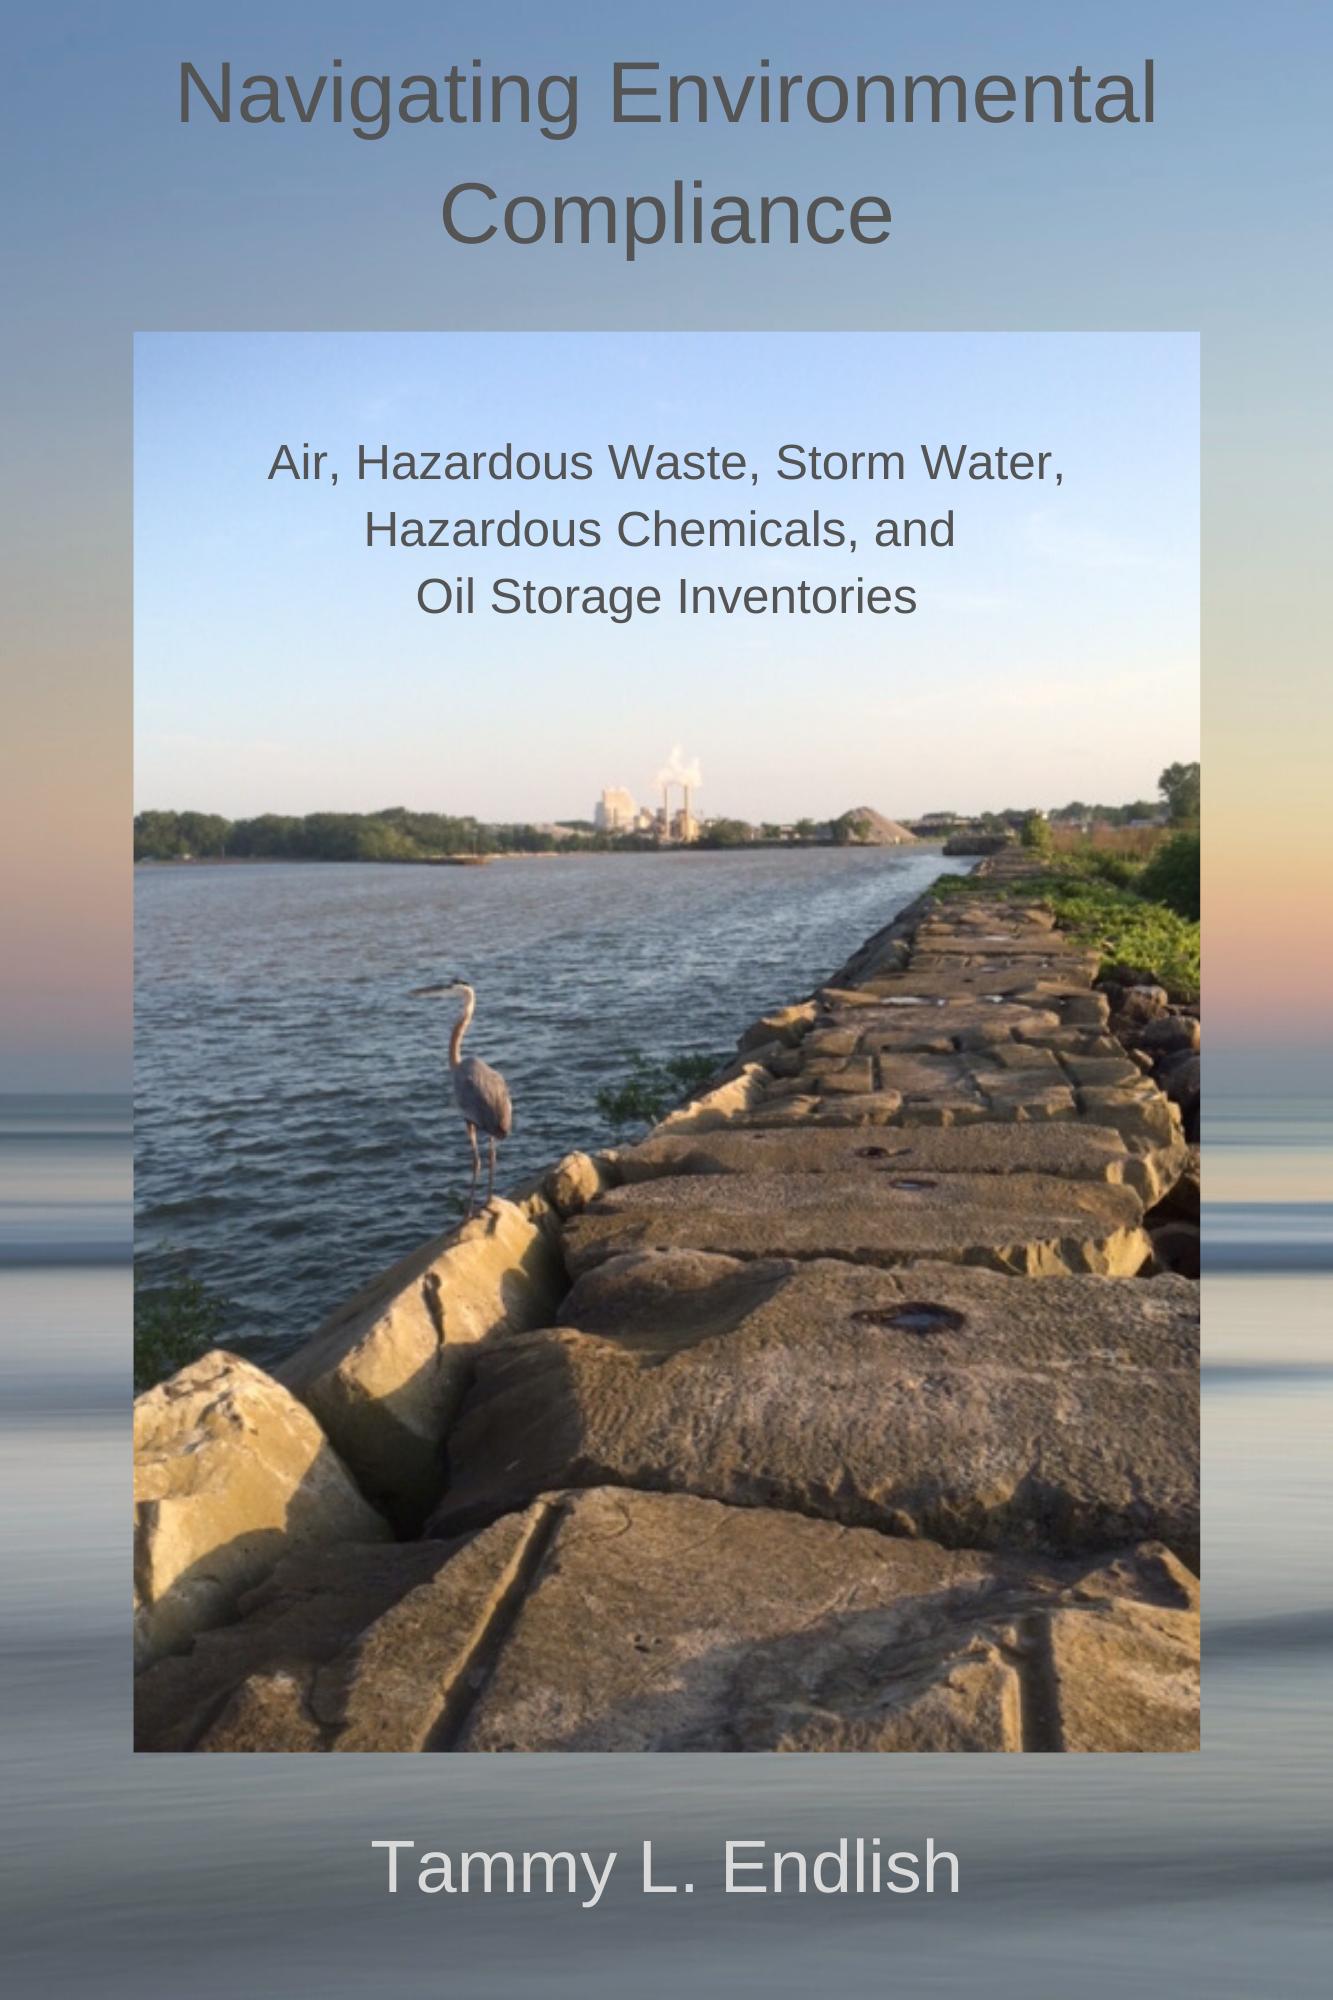 Navigating Environmental Compliance